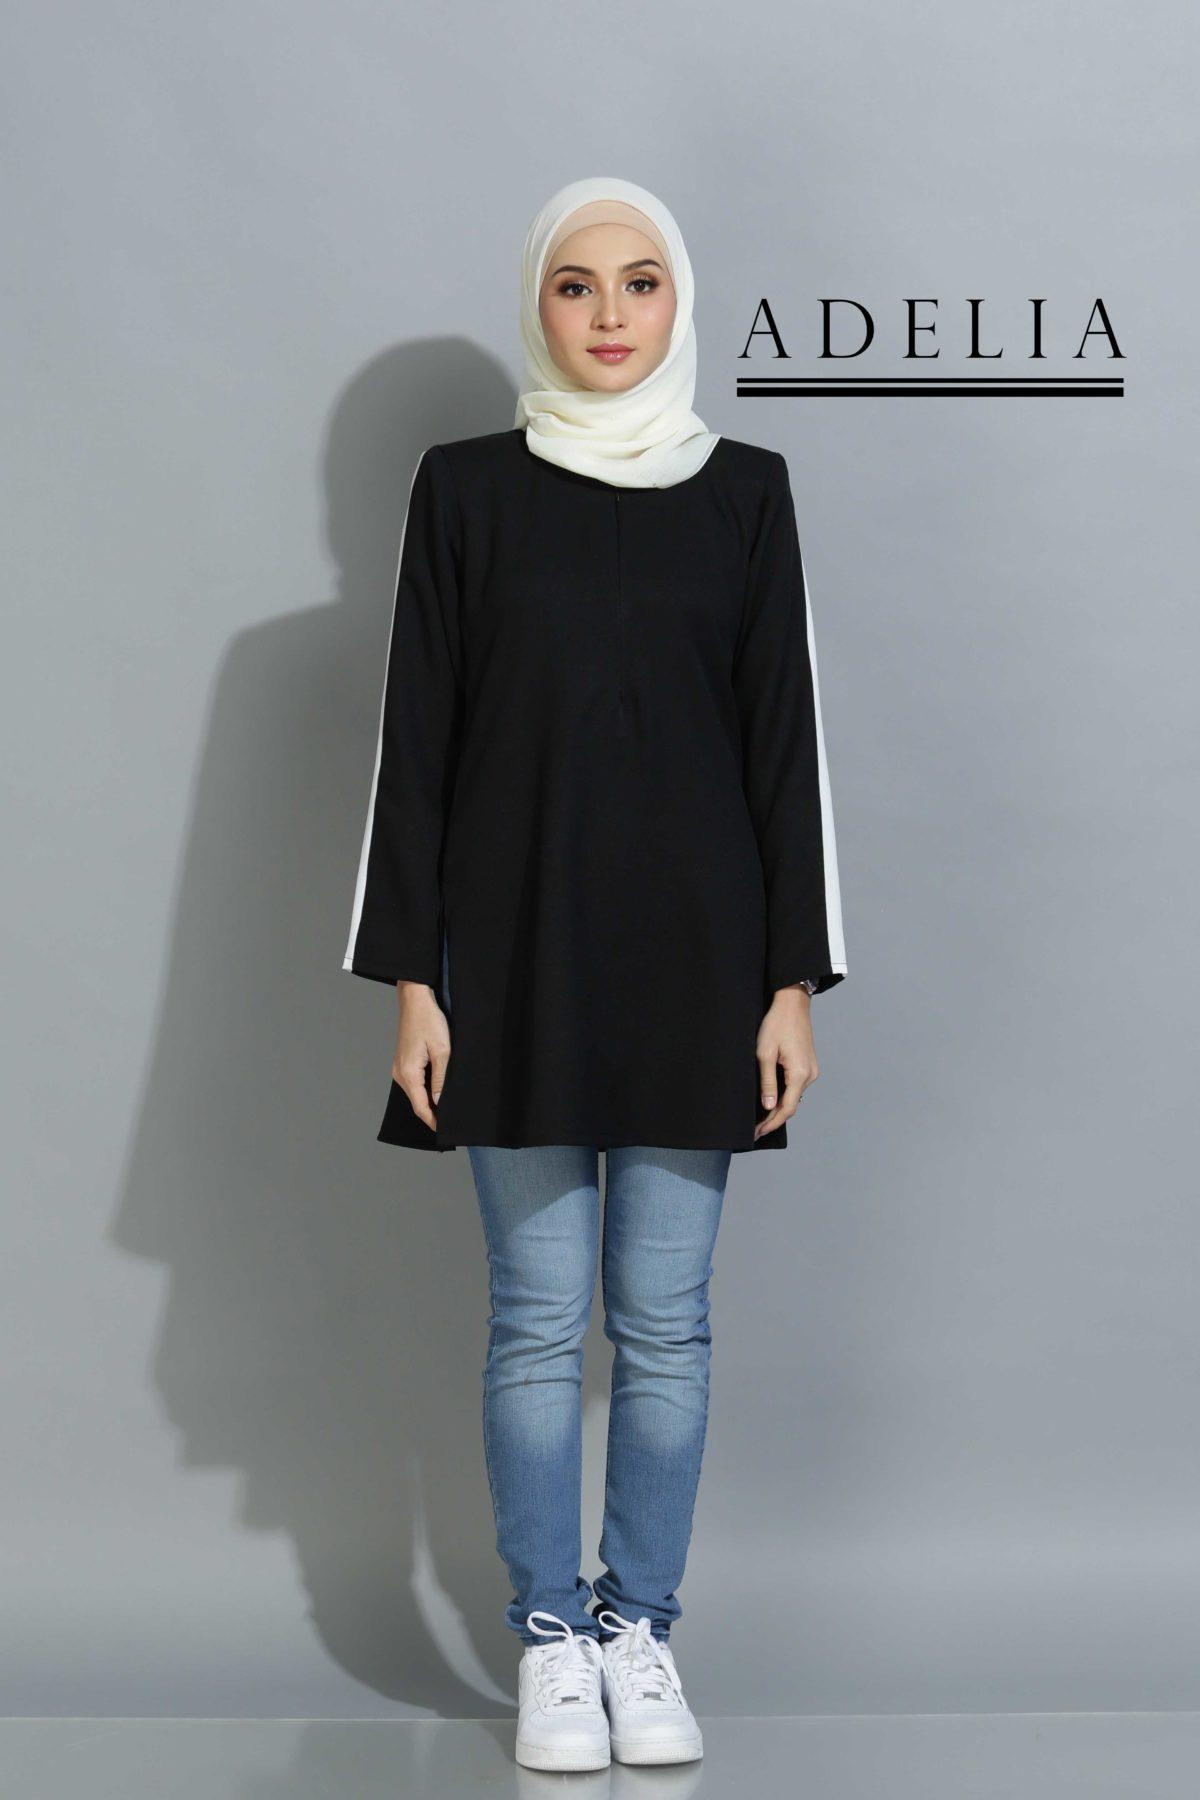 Adelia Black